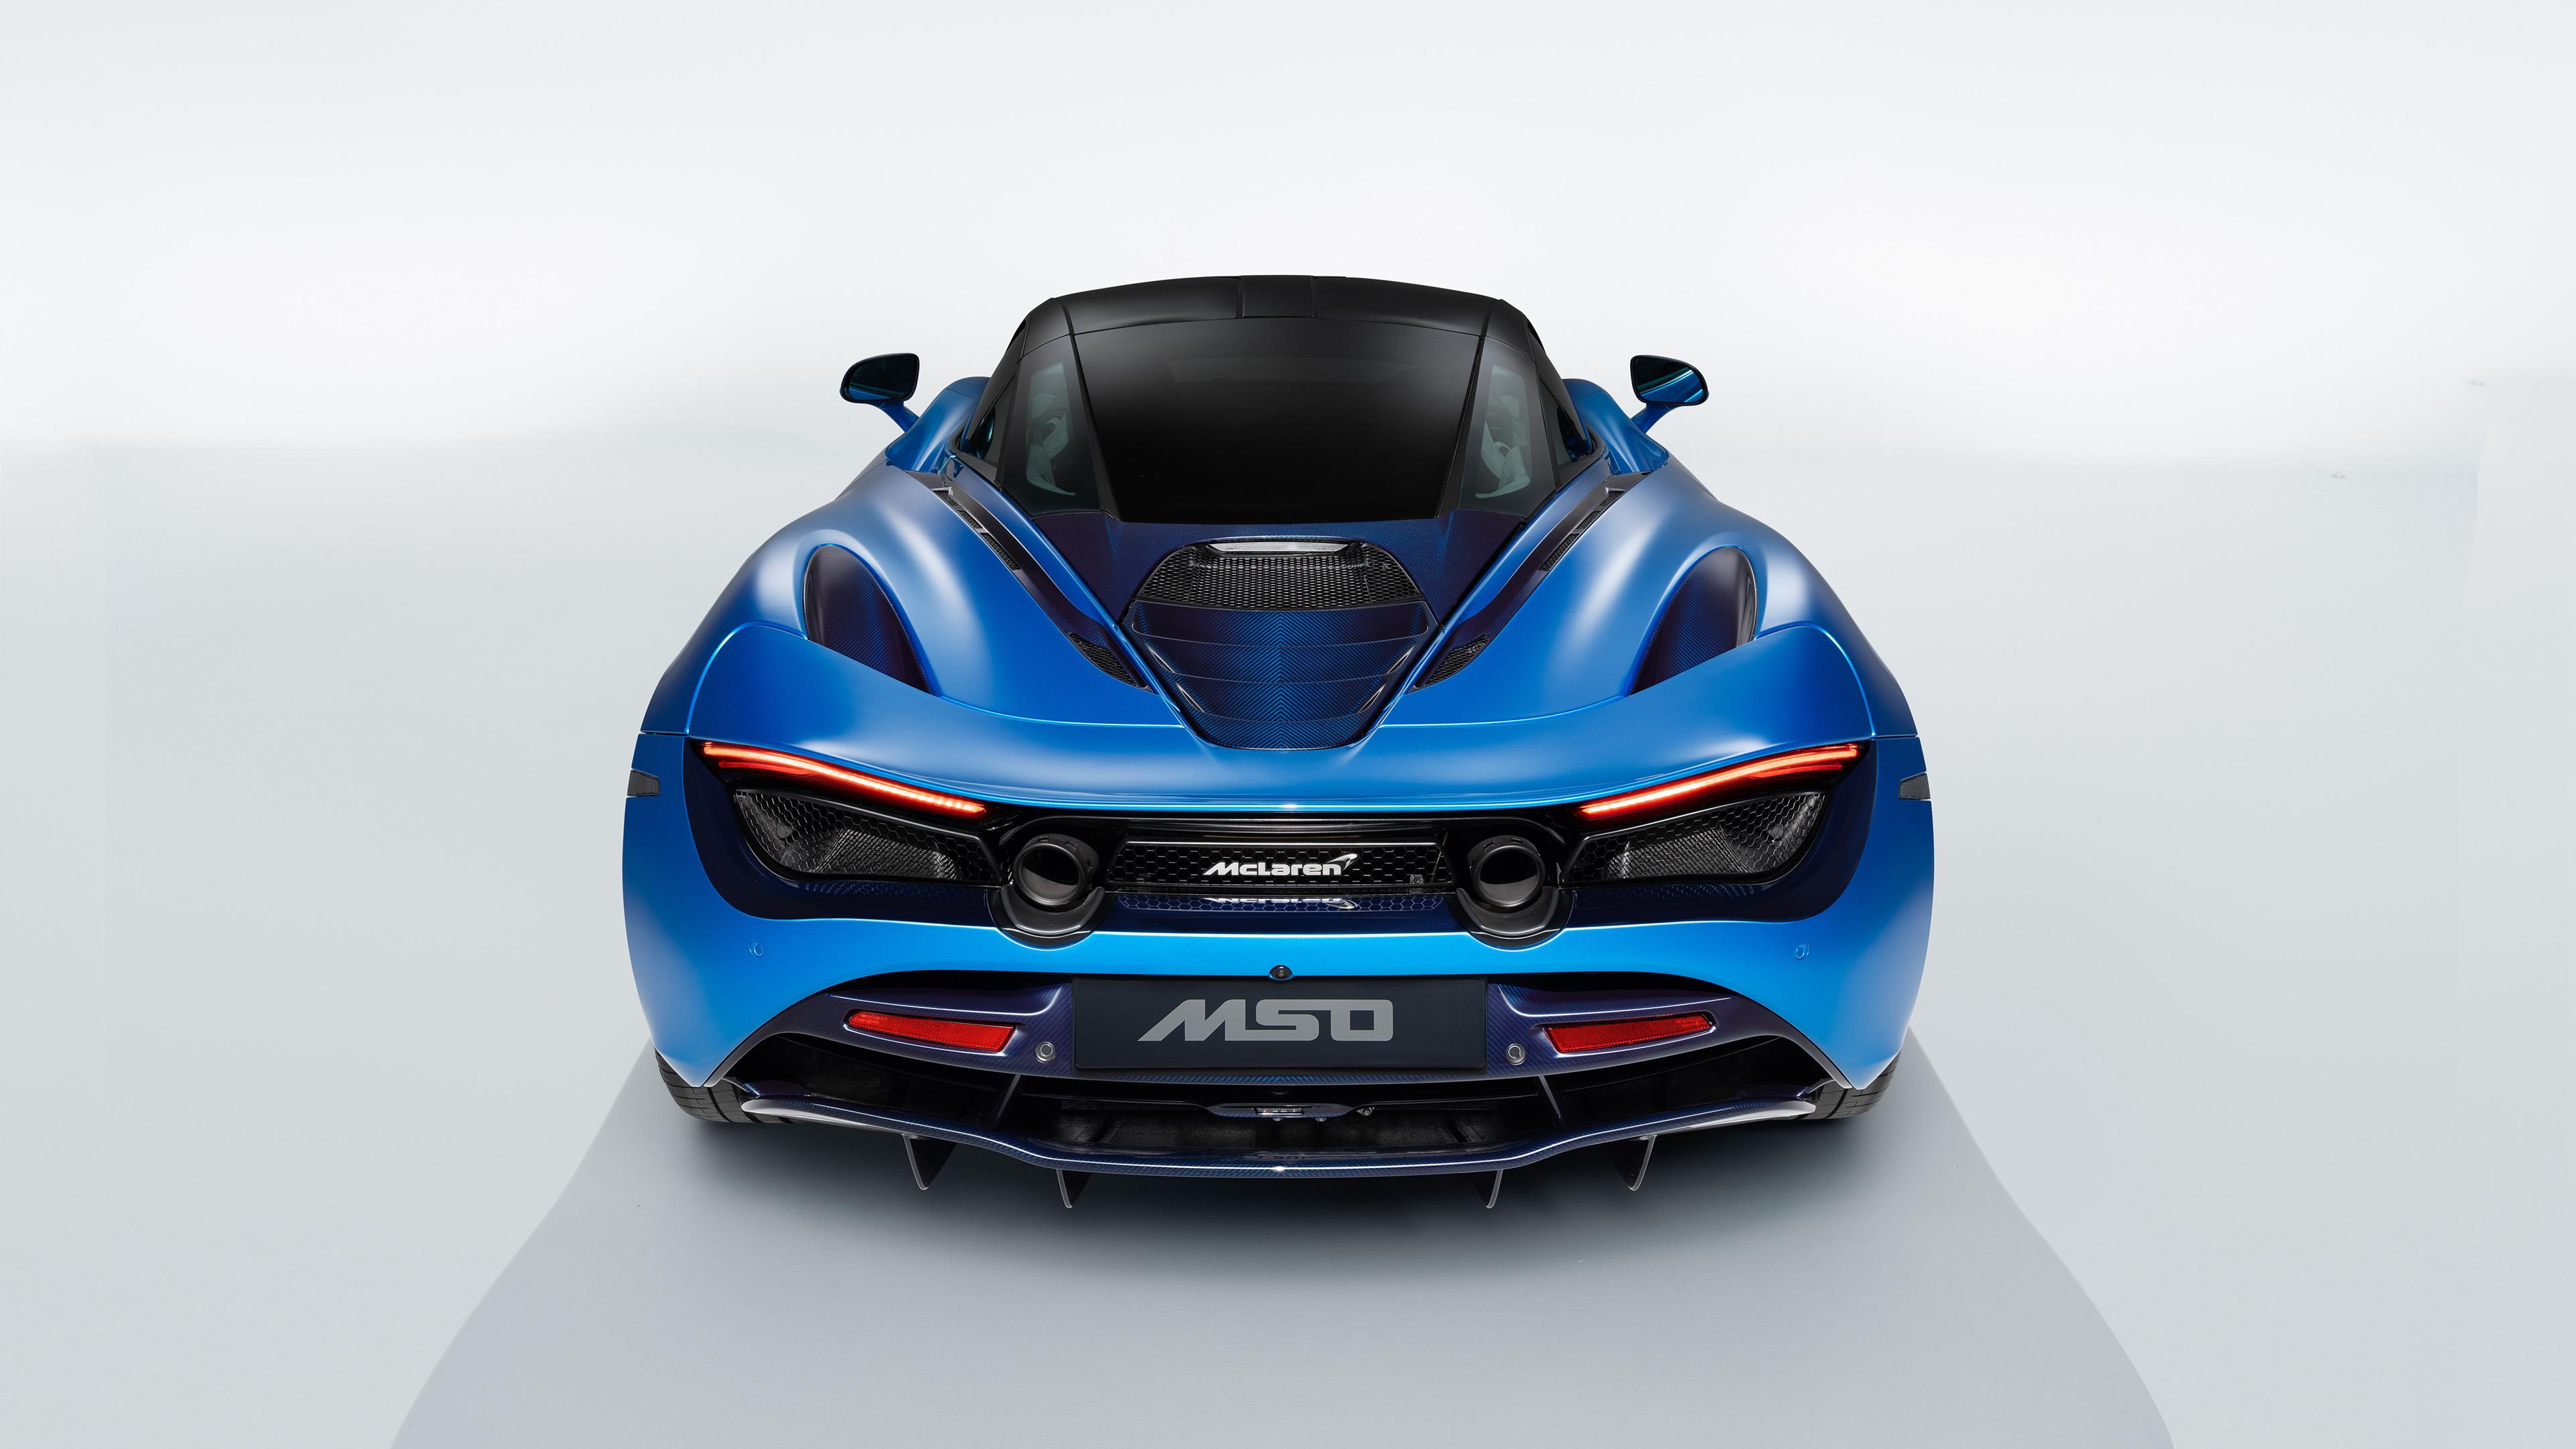 mclaren mso 720s pacific theme 2018 rear 1539113868 - McLaren MSO 720S Pacific Theme 2018 Rear - mclaren wallpapers, mclaren 720s wallpapers, hd-wallpapers, cars wallpapers, 4k-wallpapers, 2018 cars wallpapers